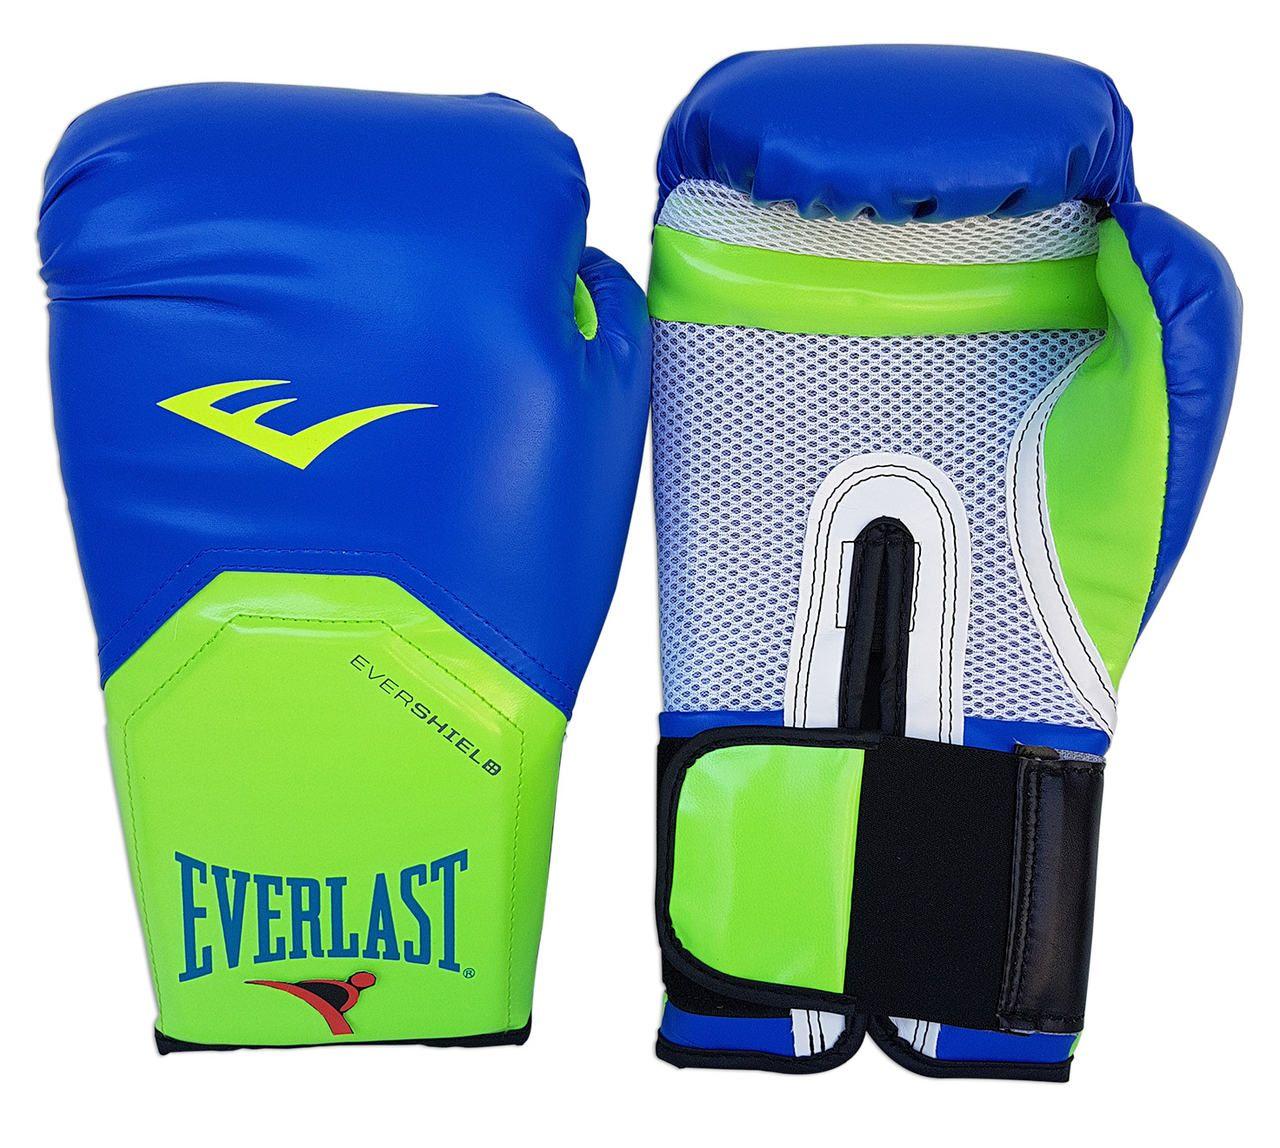 Luva de Boxe / Muay Thai 14oz - Azul com Verde - Pro Style - Everlast  - PRALUTA SHOP